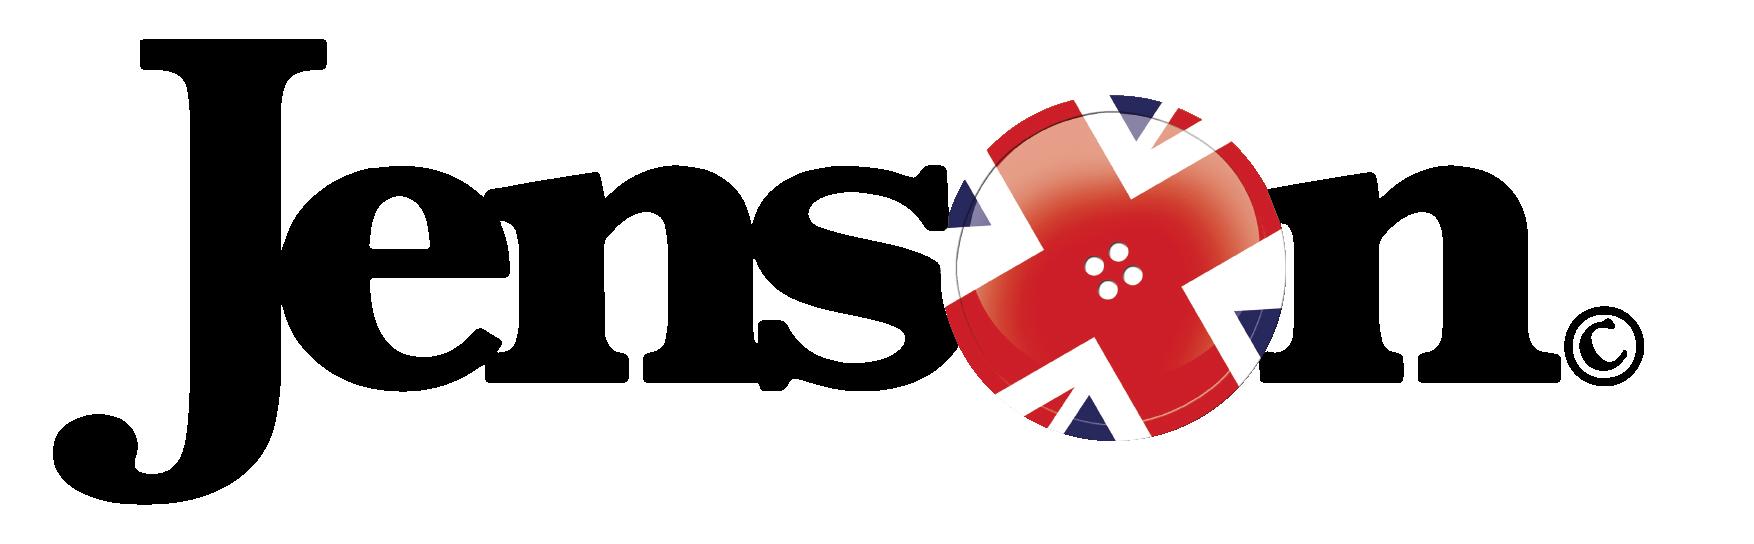 The official jenson logo. Website clipart website button